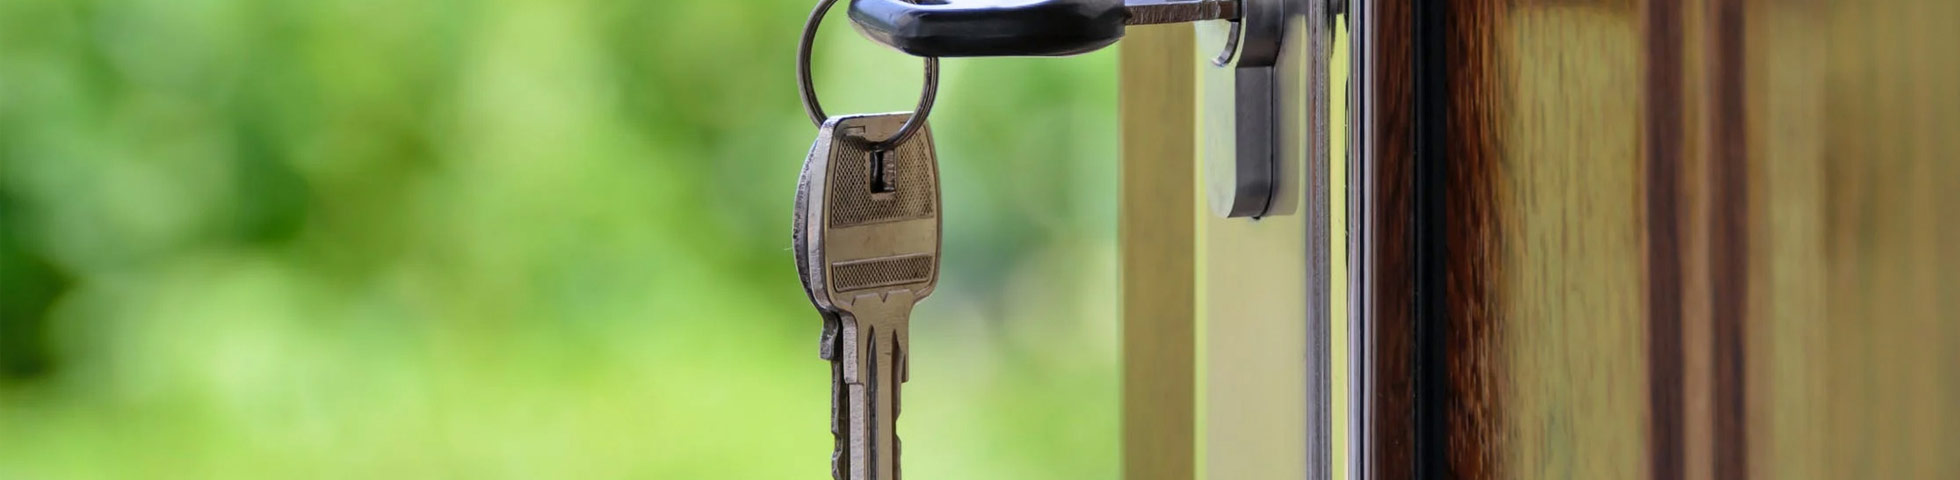 Photography of keys on a door.